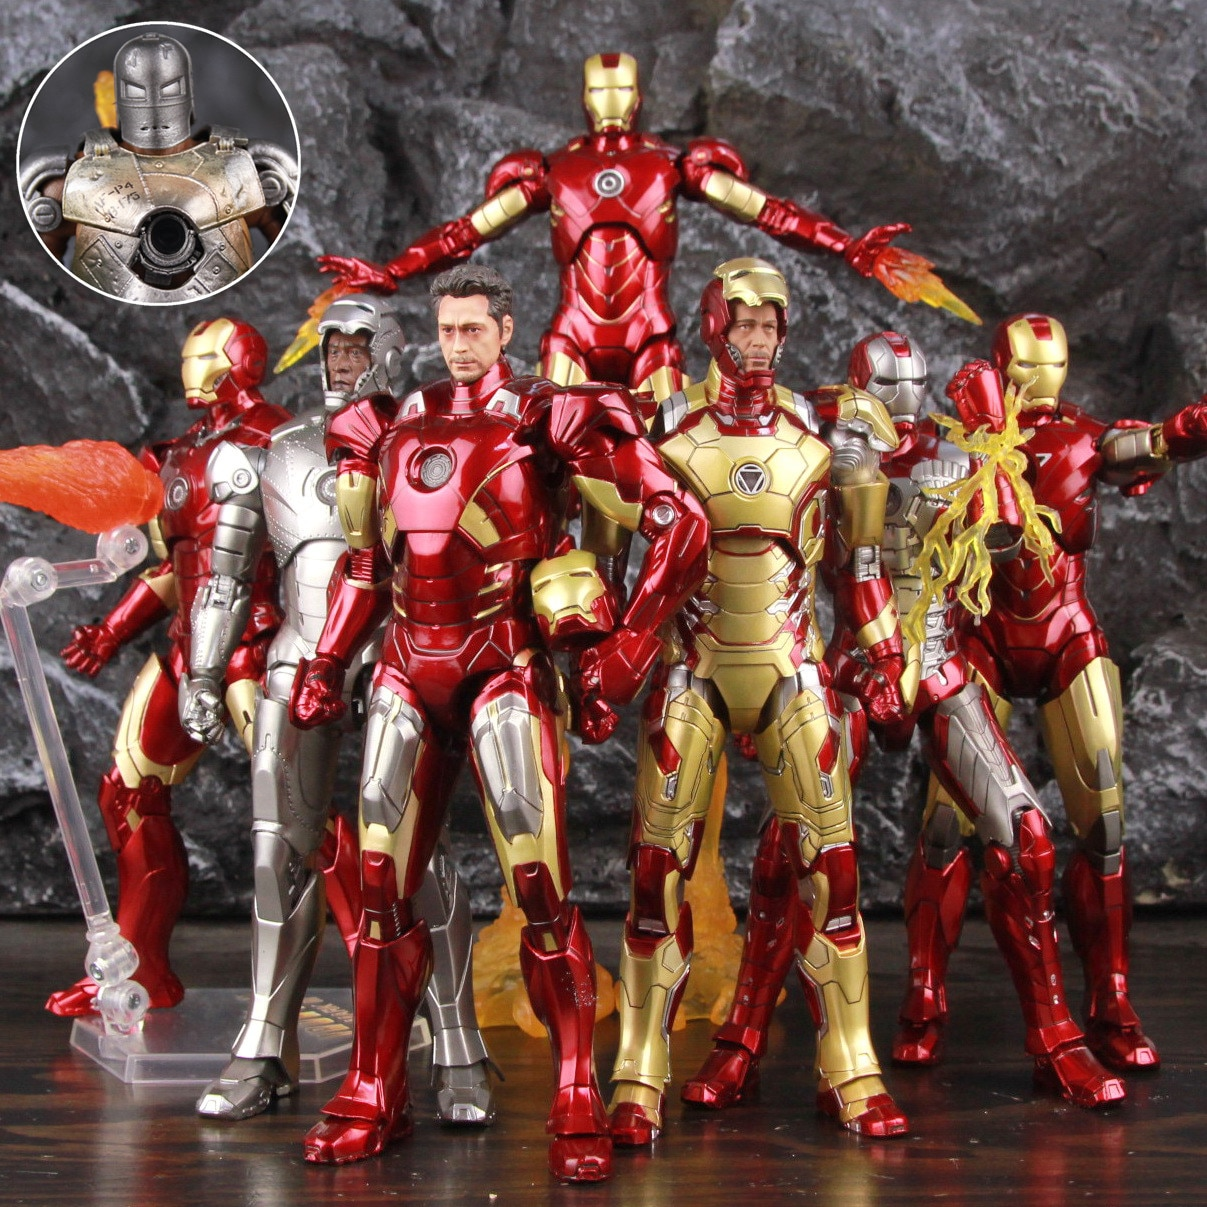 Marvel Iron Man MK1 MK2 MK3 MK4 MK5 MK6 MK7 MK42 7